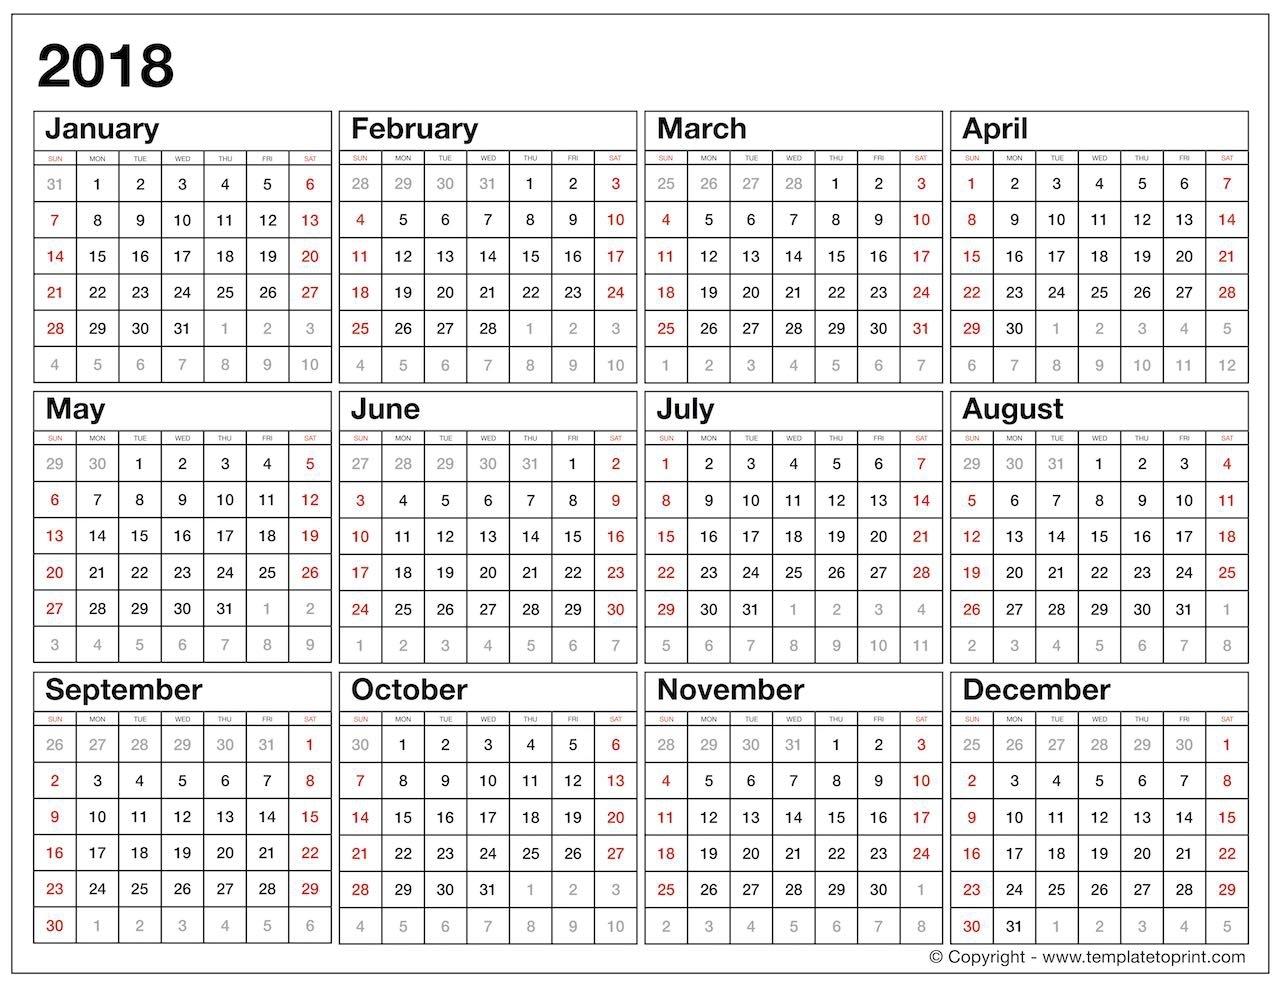 Year At A Glance Printable Calendar 2018 | Printable Calendar throughout Blank Year At A Glance Calendar Template